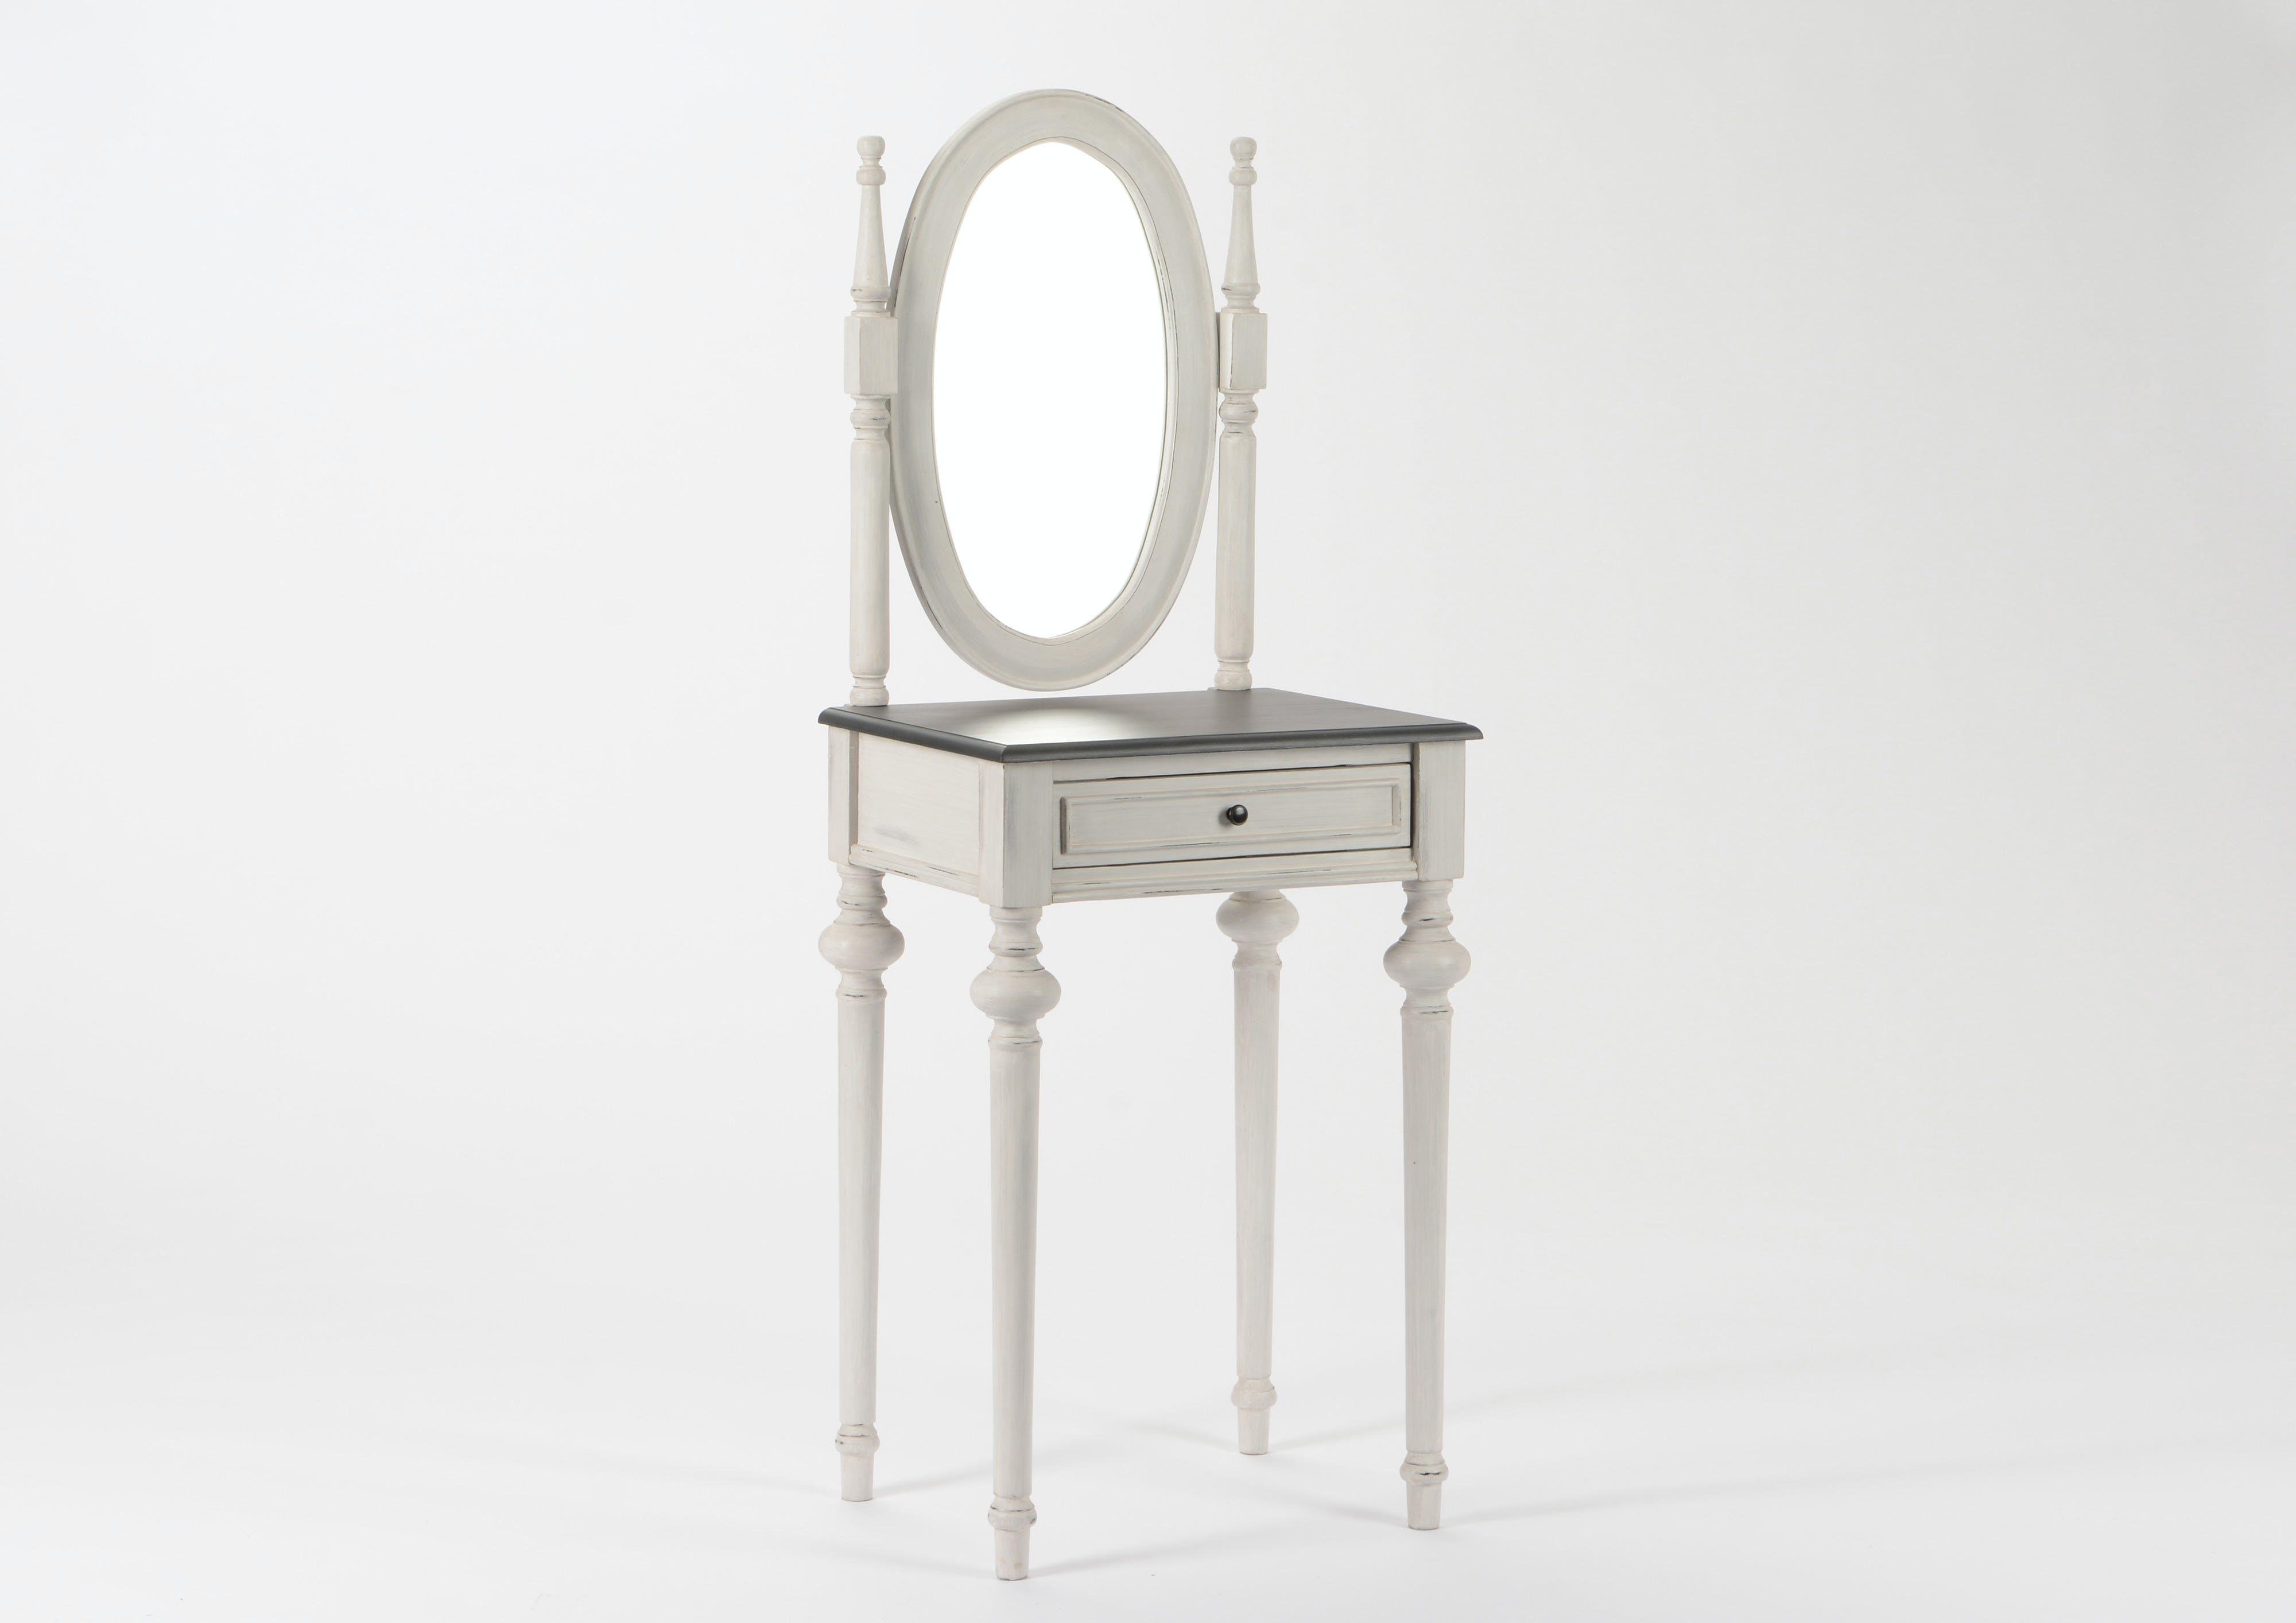 Coiffeuse Baroque 1 tiroir et miroir HERITAGE bois blanchi plateau anthracite 50x40x137cm AMADEUS